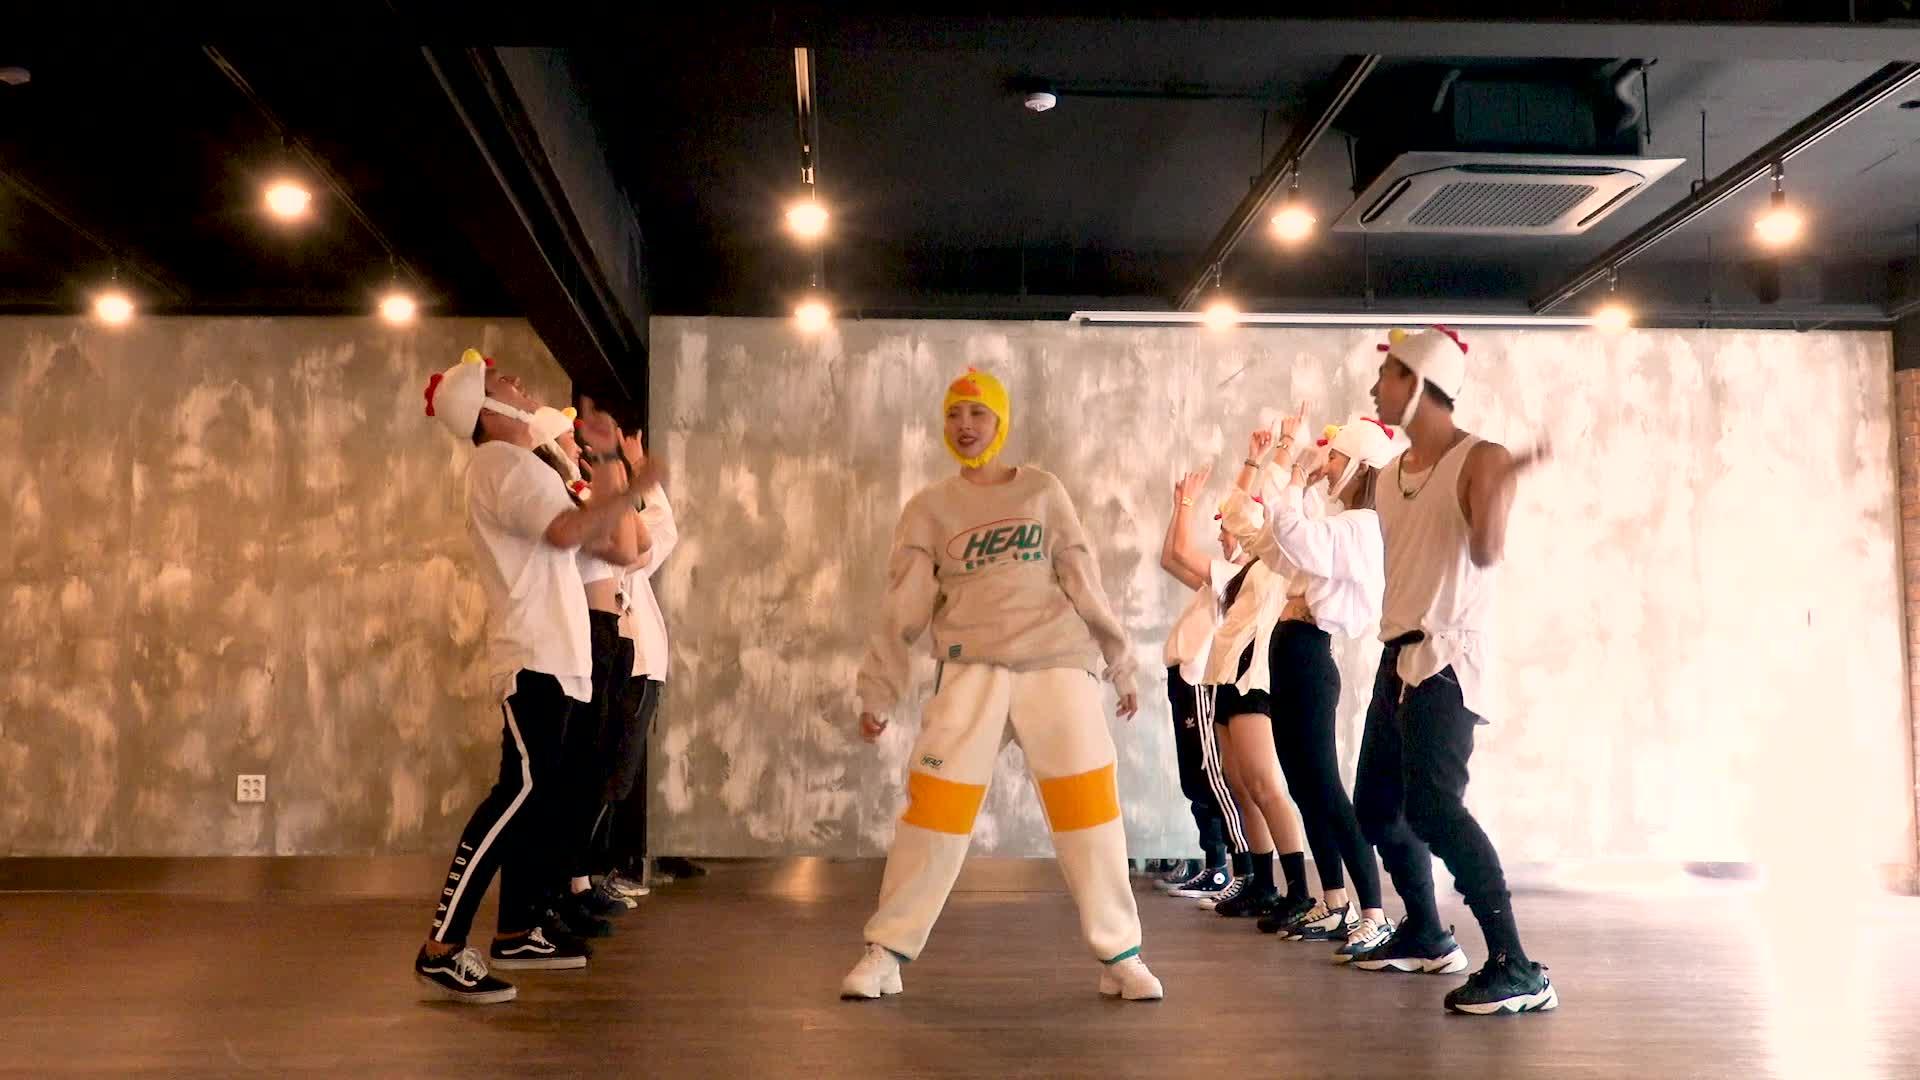 [Choreography Practice] 선미 (SUNMI) '날라리(LALALAY)' 안무 연습 영상 (for miya-ne ver.)